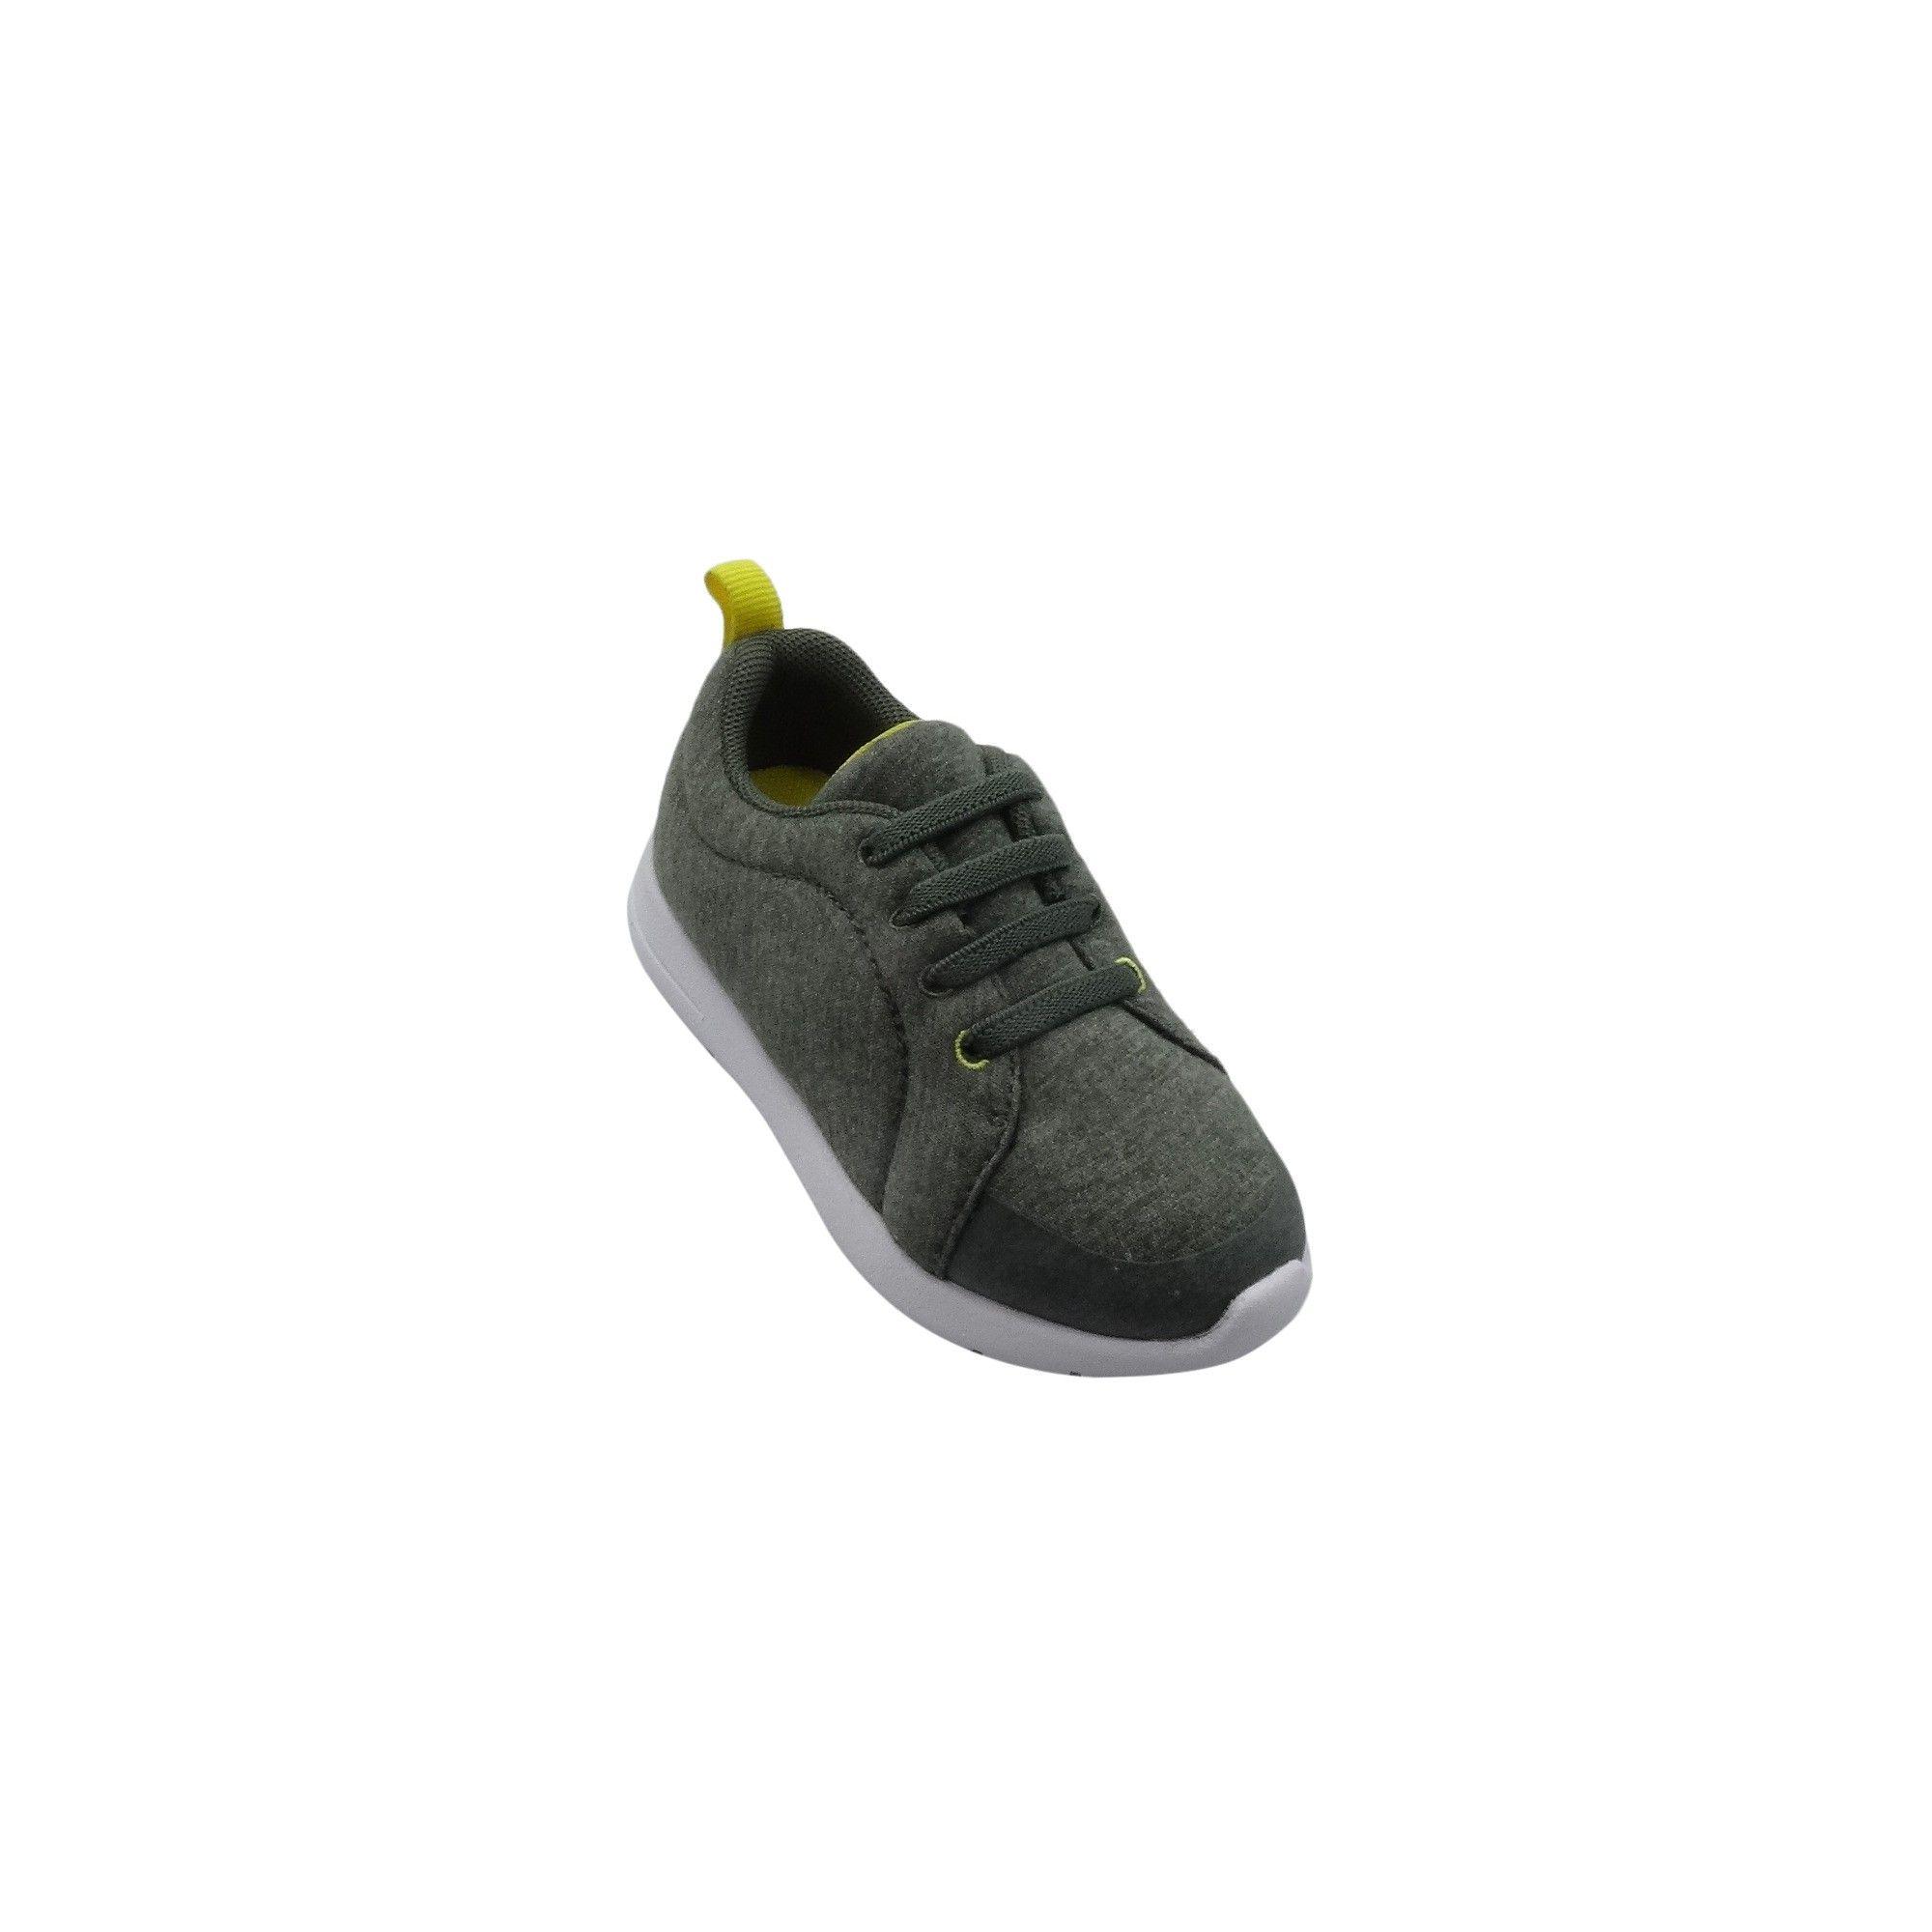 Toddler Boys Dex Casual Sneakers Cat & Jack Green 10